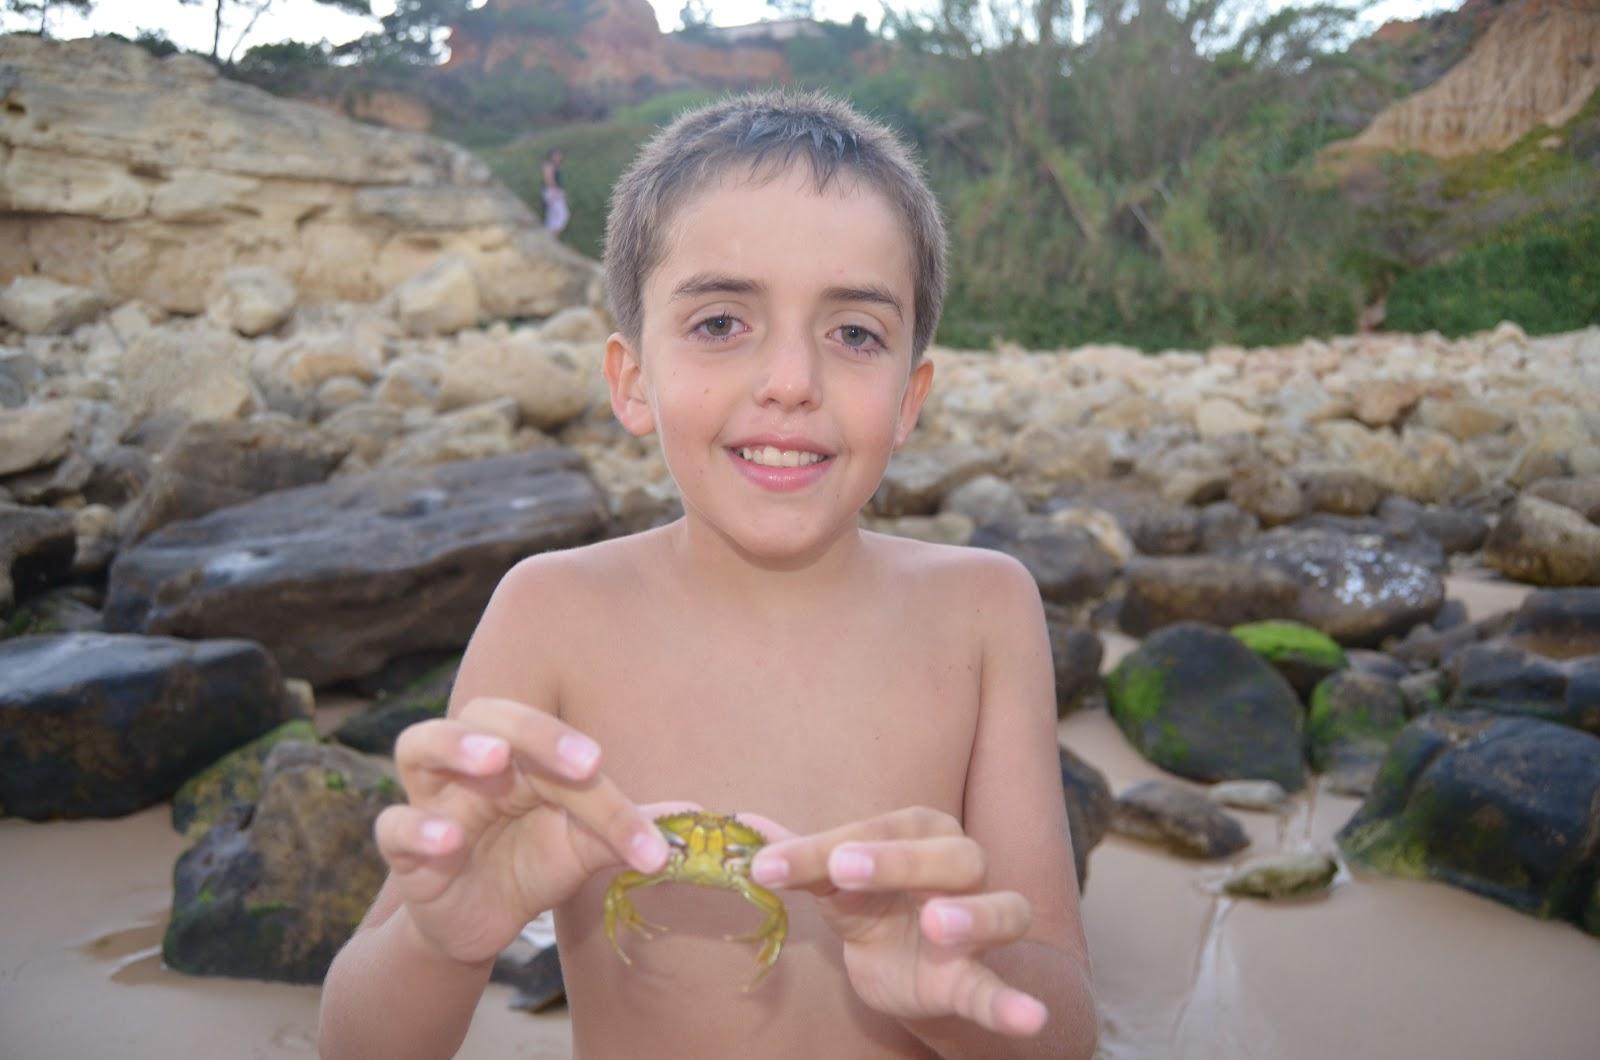 Las tareas de david villalba mi viaje a portugal - David villalba ...